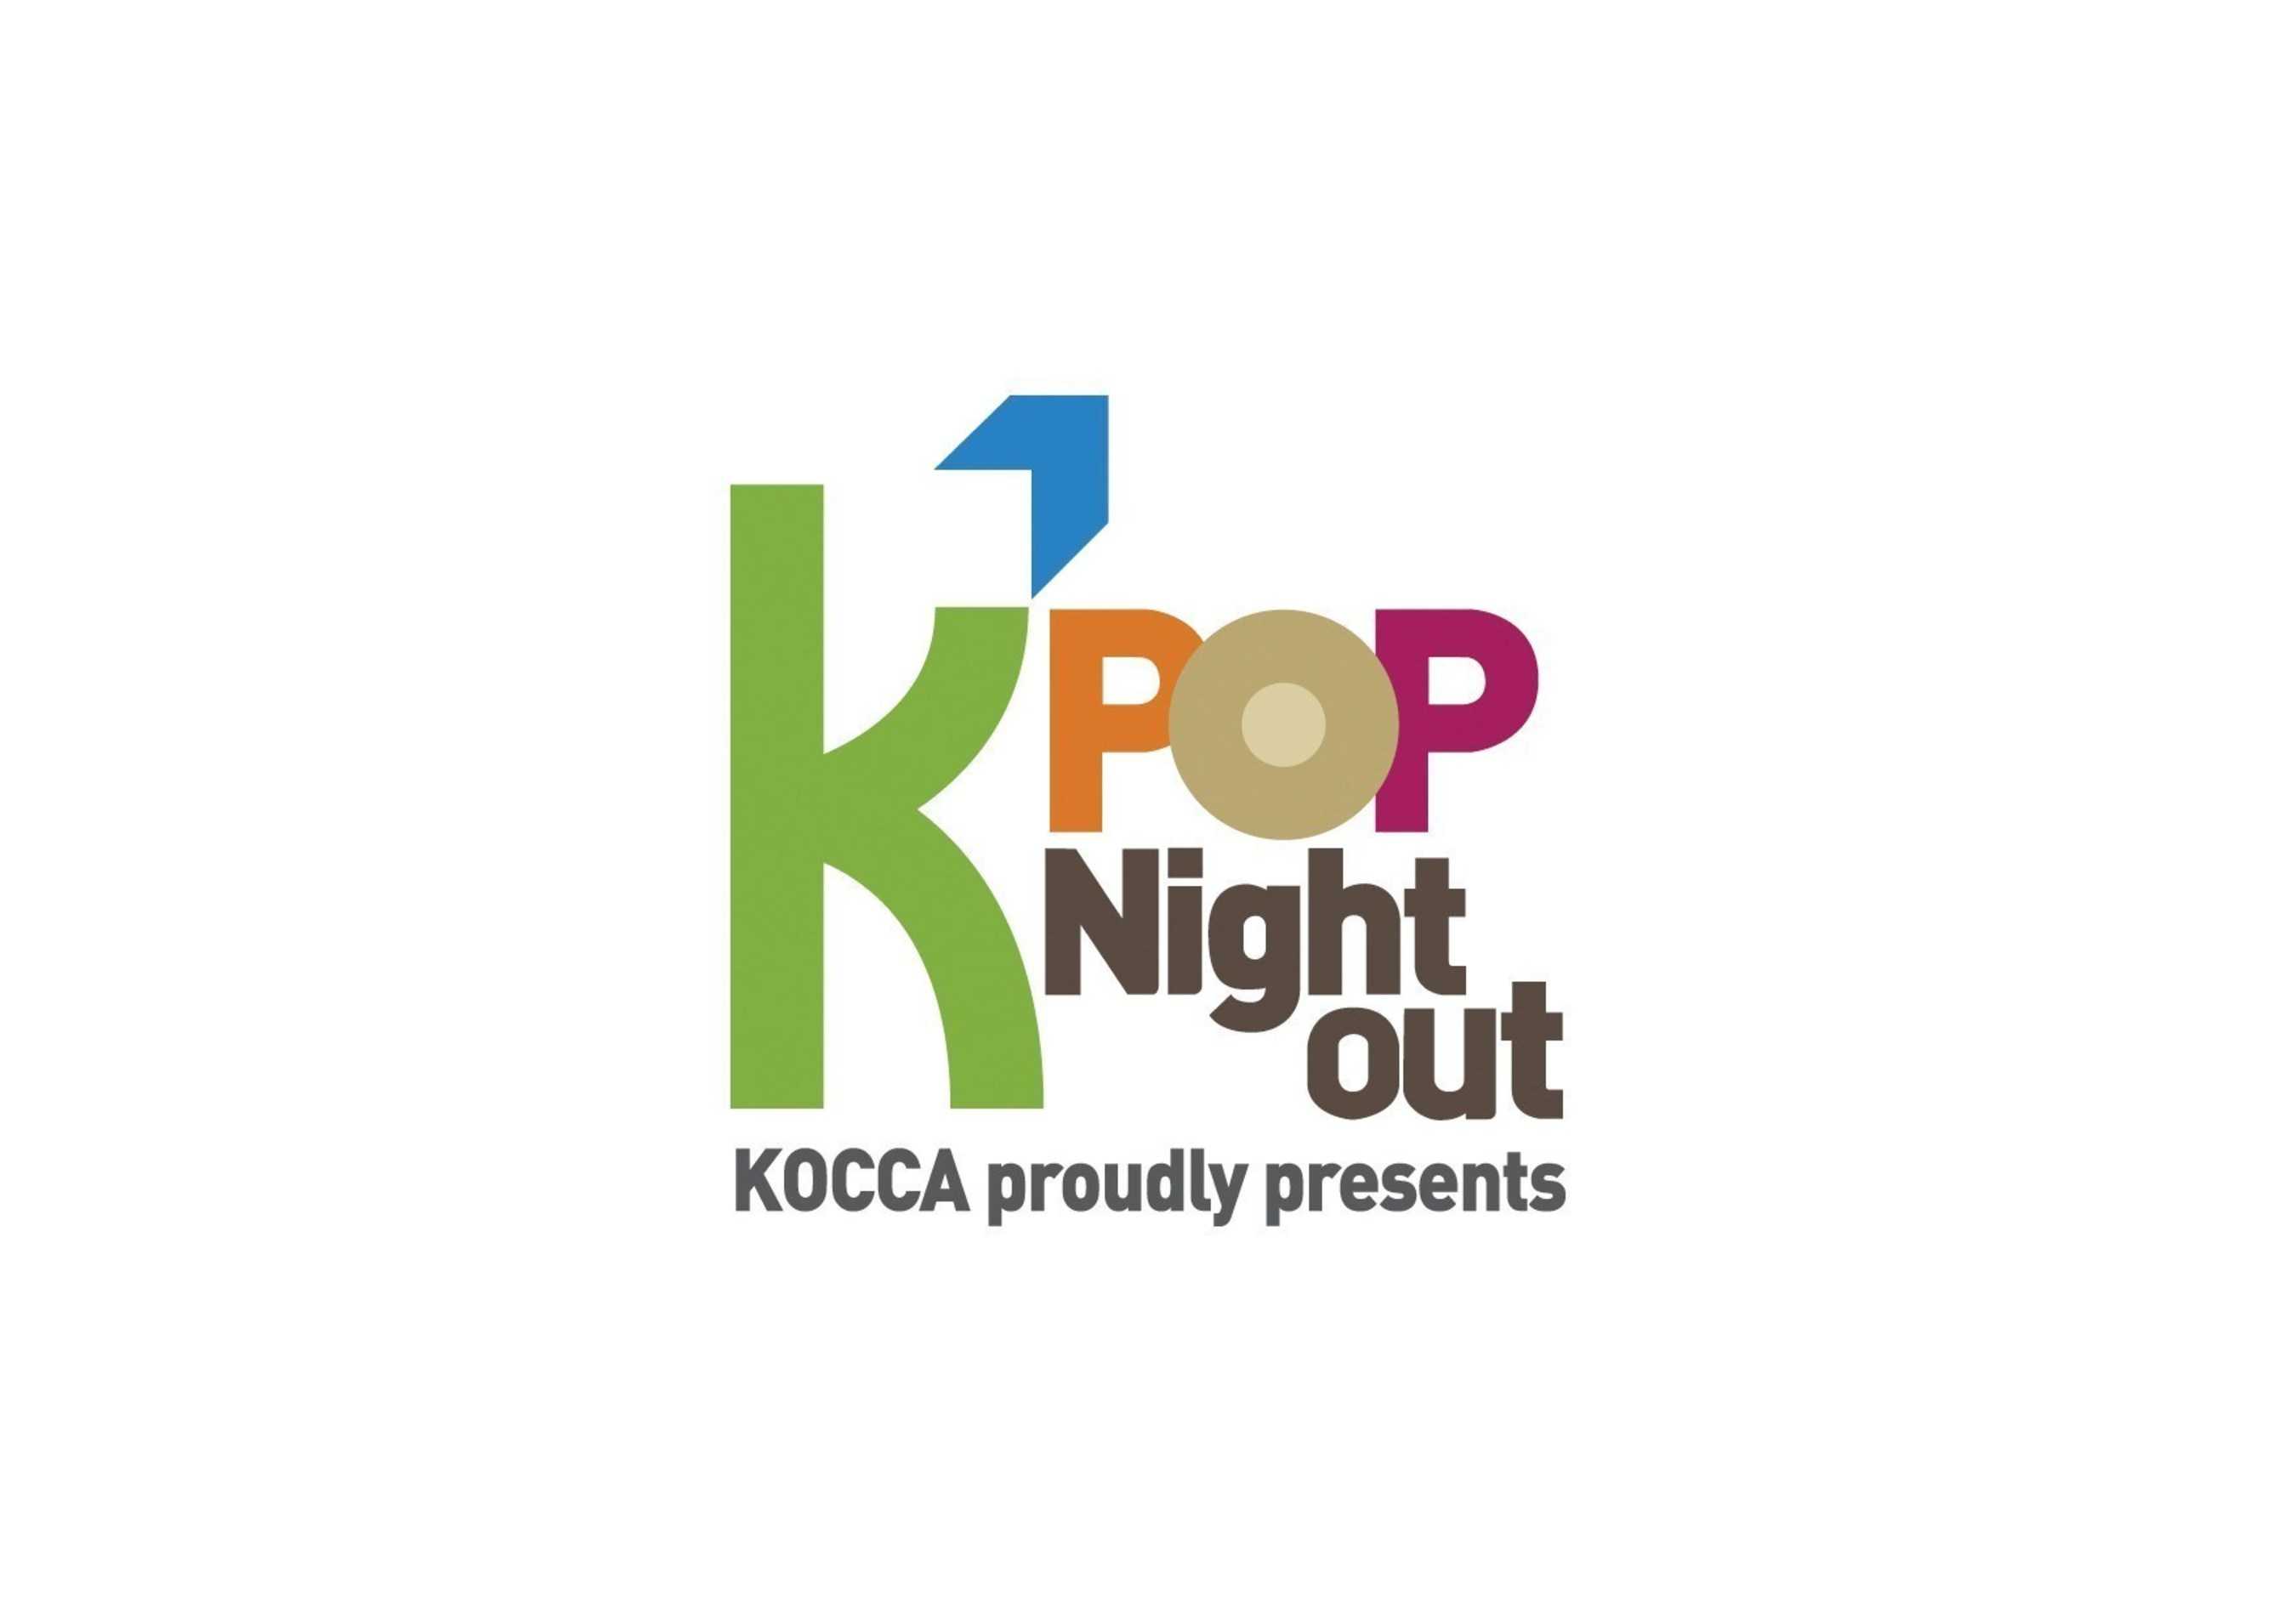 K-POP NIGHT OUT logo